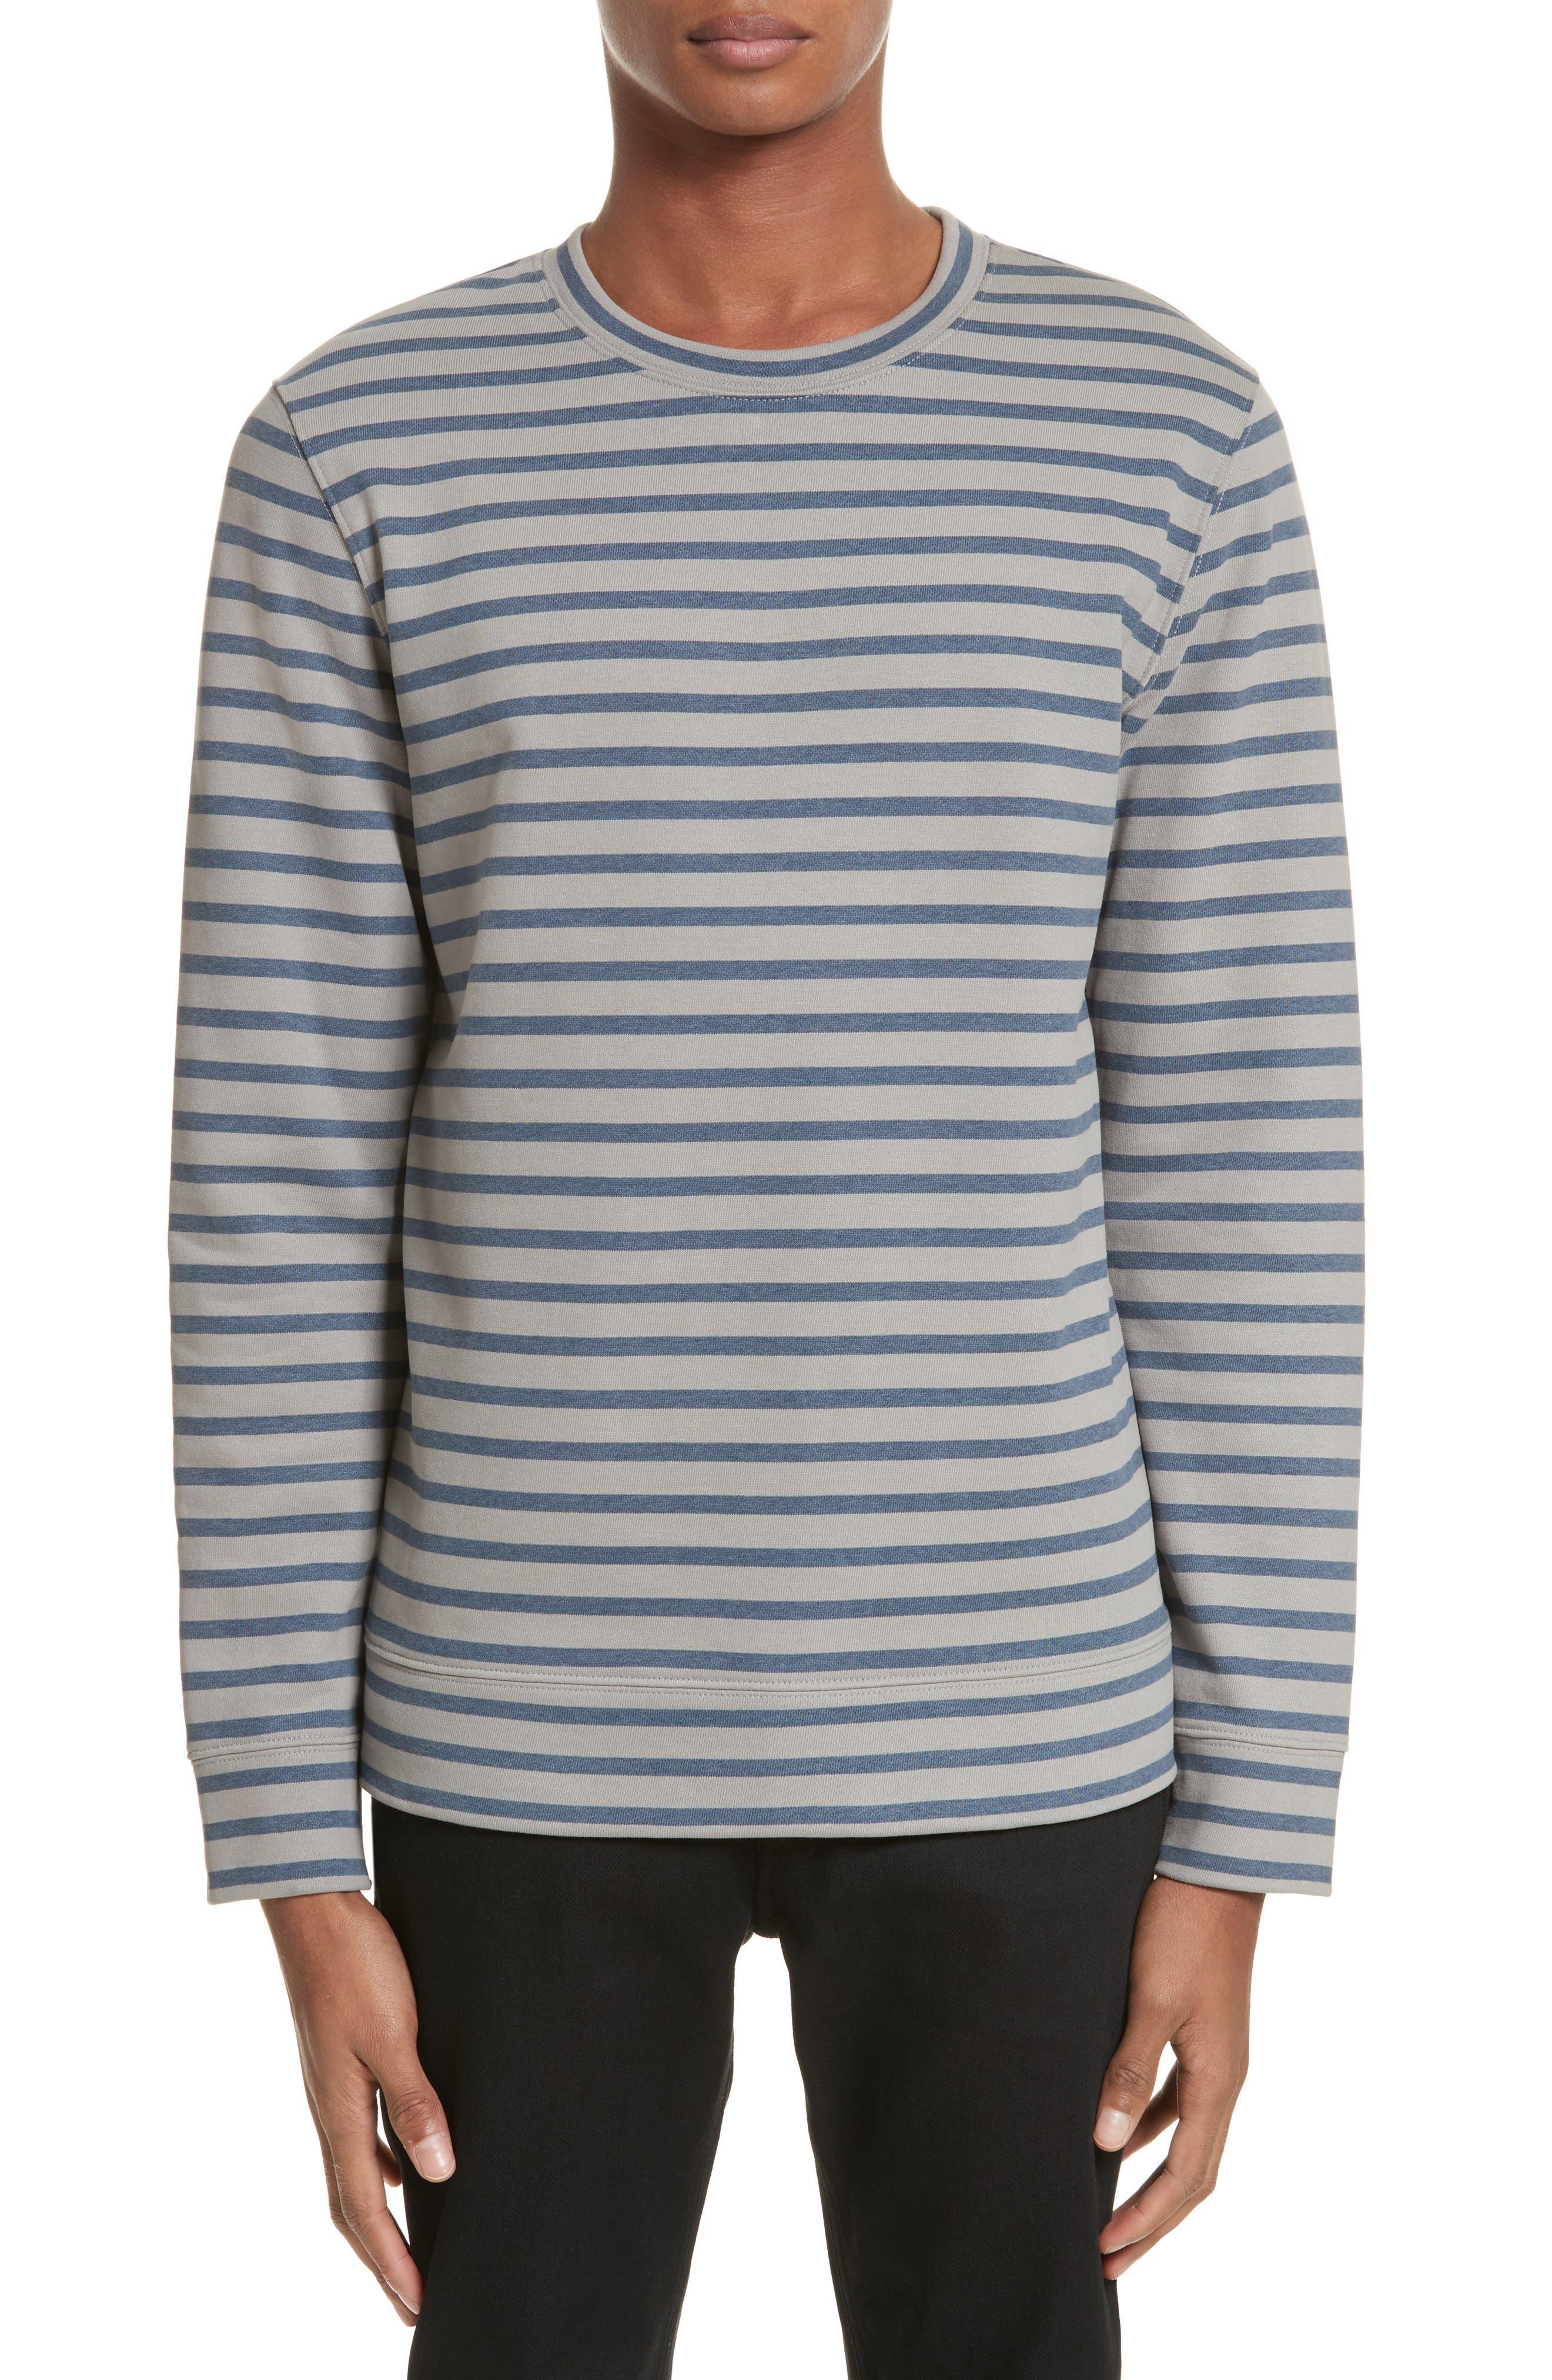 Main Image - A.P.C. Albert Stripe Crewneck Sweatshirt